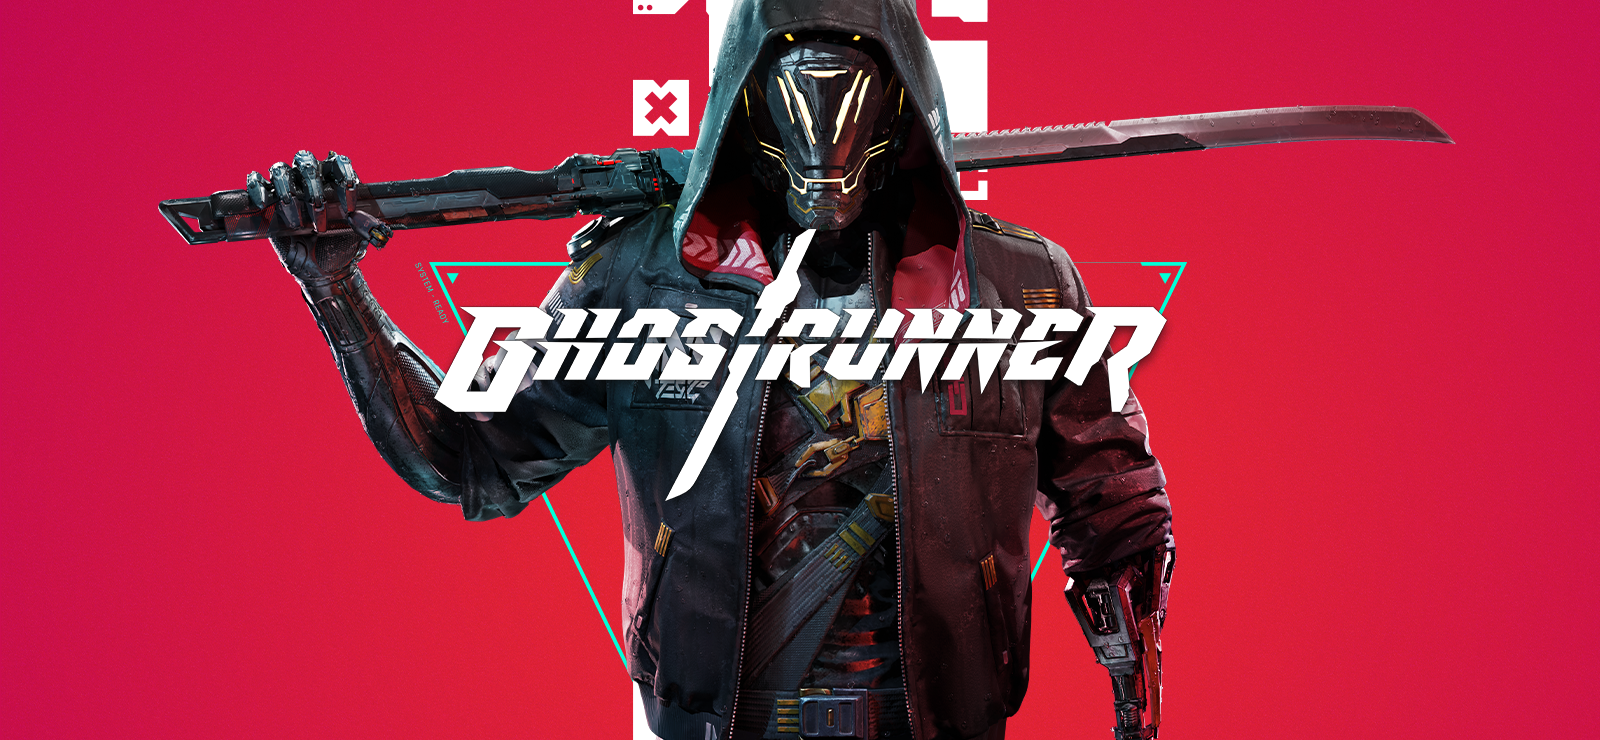 Ghostrunner 2 01239